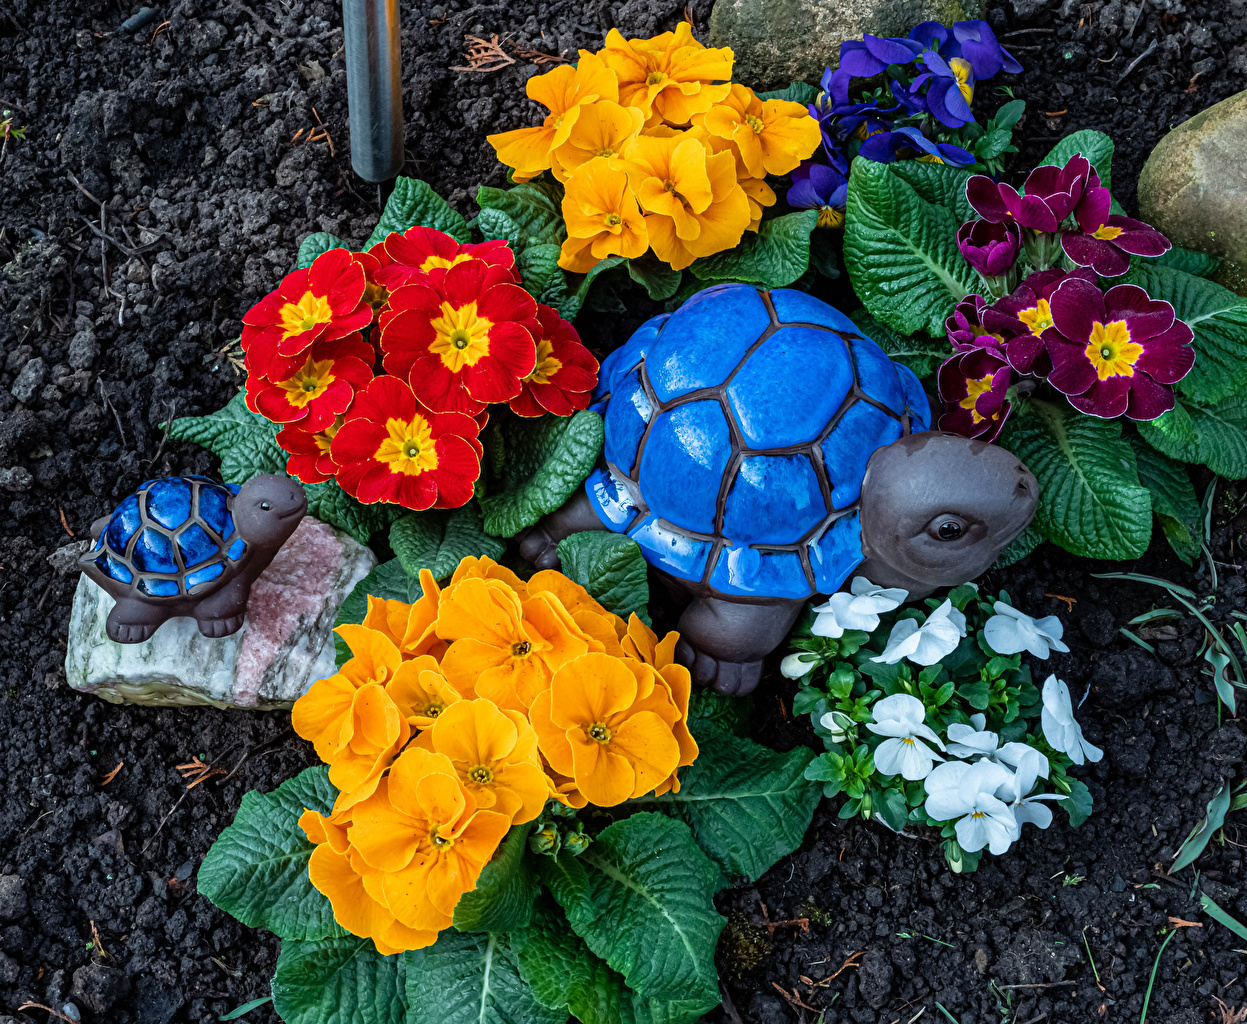 Pictures Turtles Multicolor flower Primula Flowers